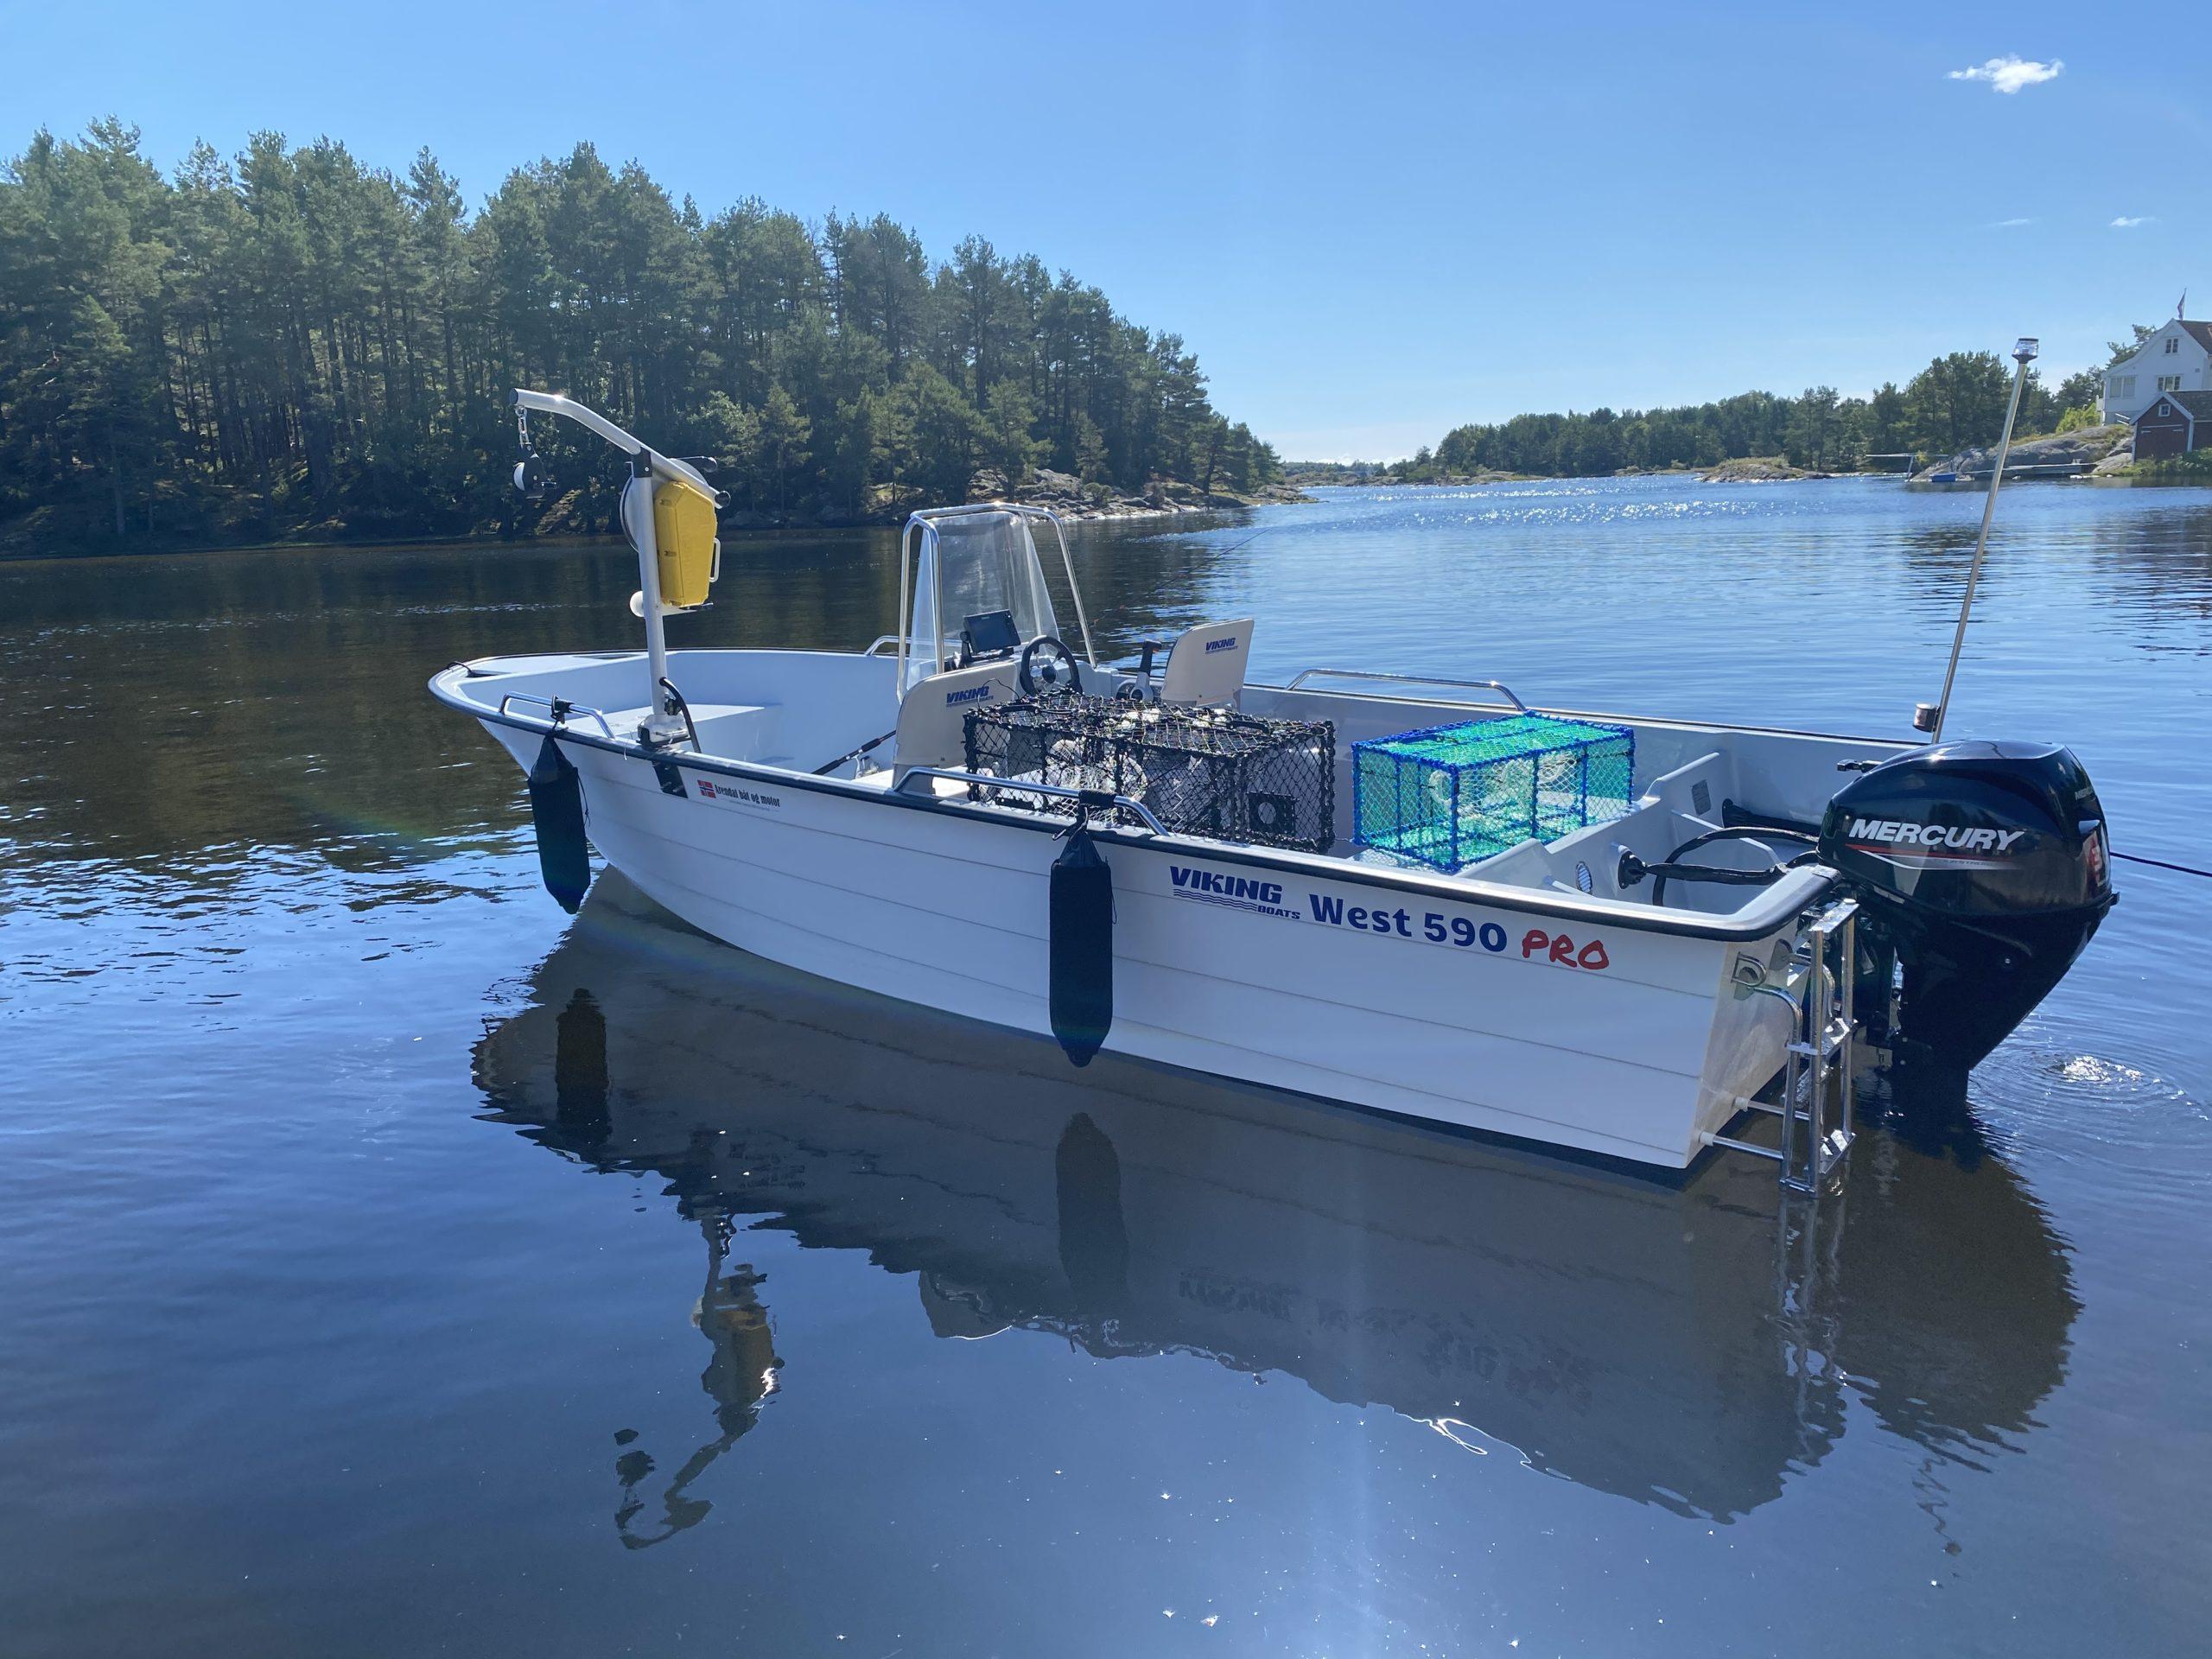 Viking Boats West 590 Pro